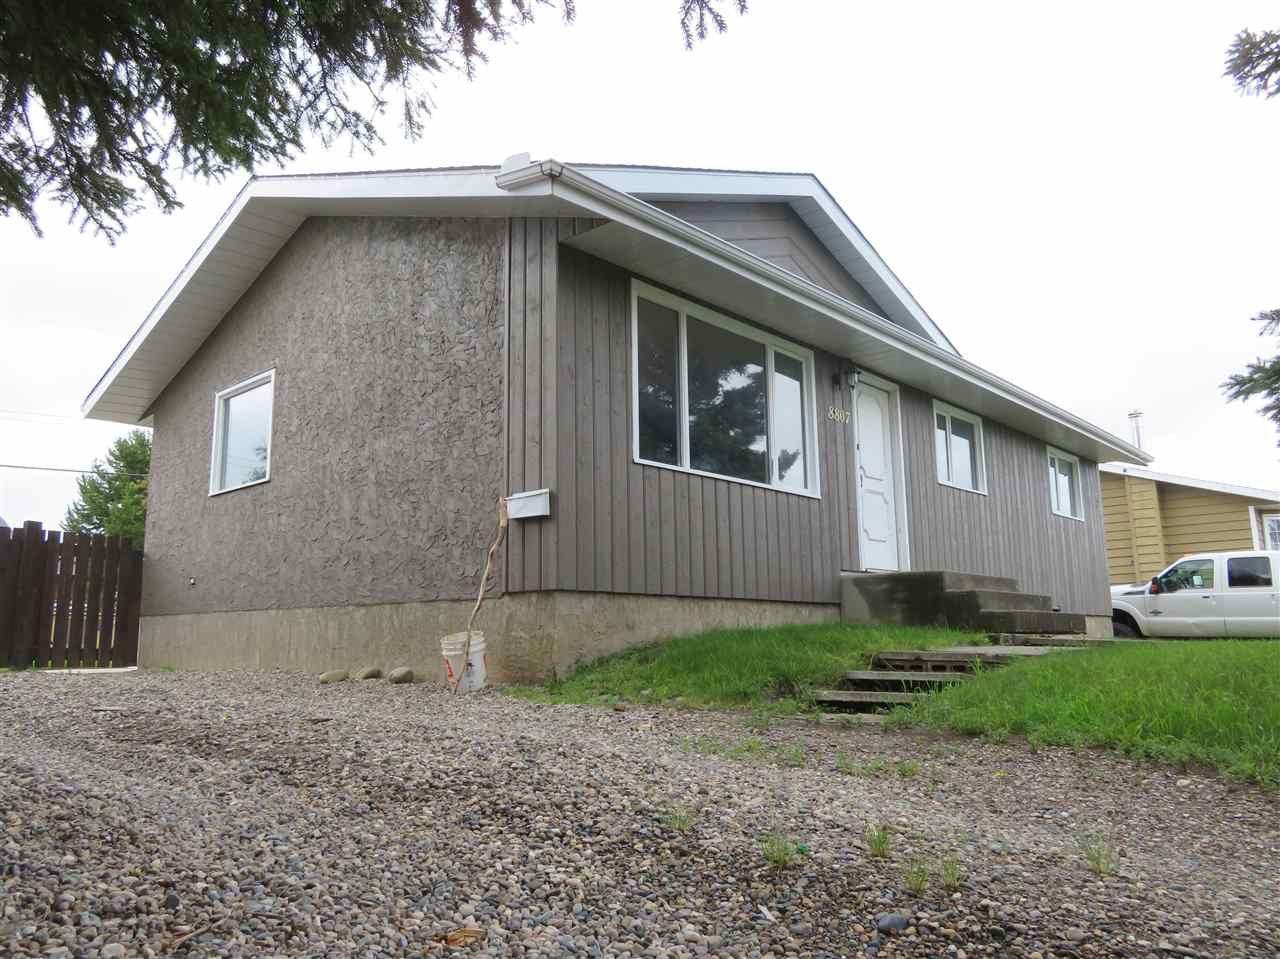 Main Photo: 8807 116 AVENUE in : Fort St. John - City NE House for sale : MLS®# R2387923